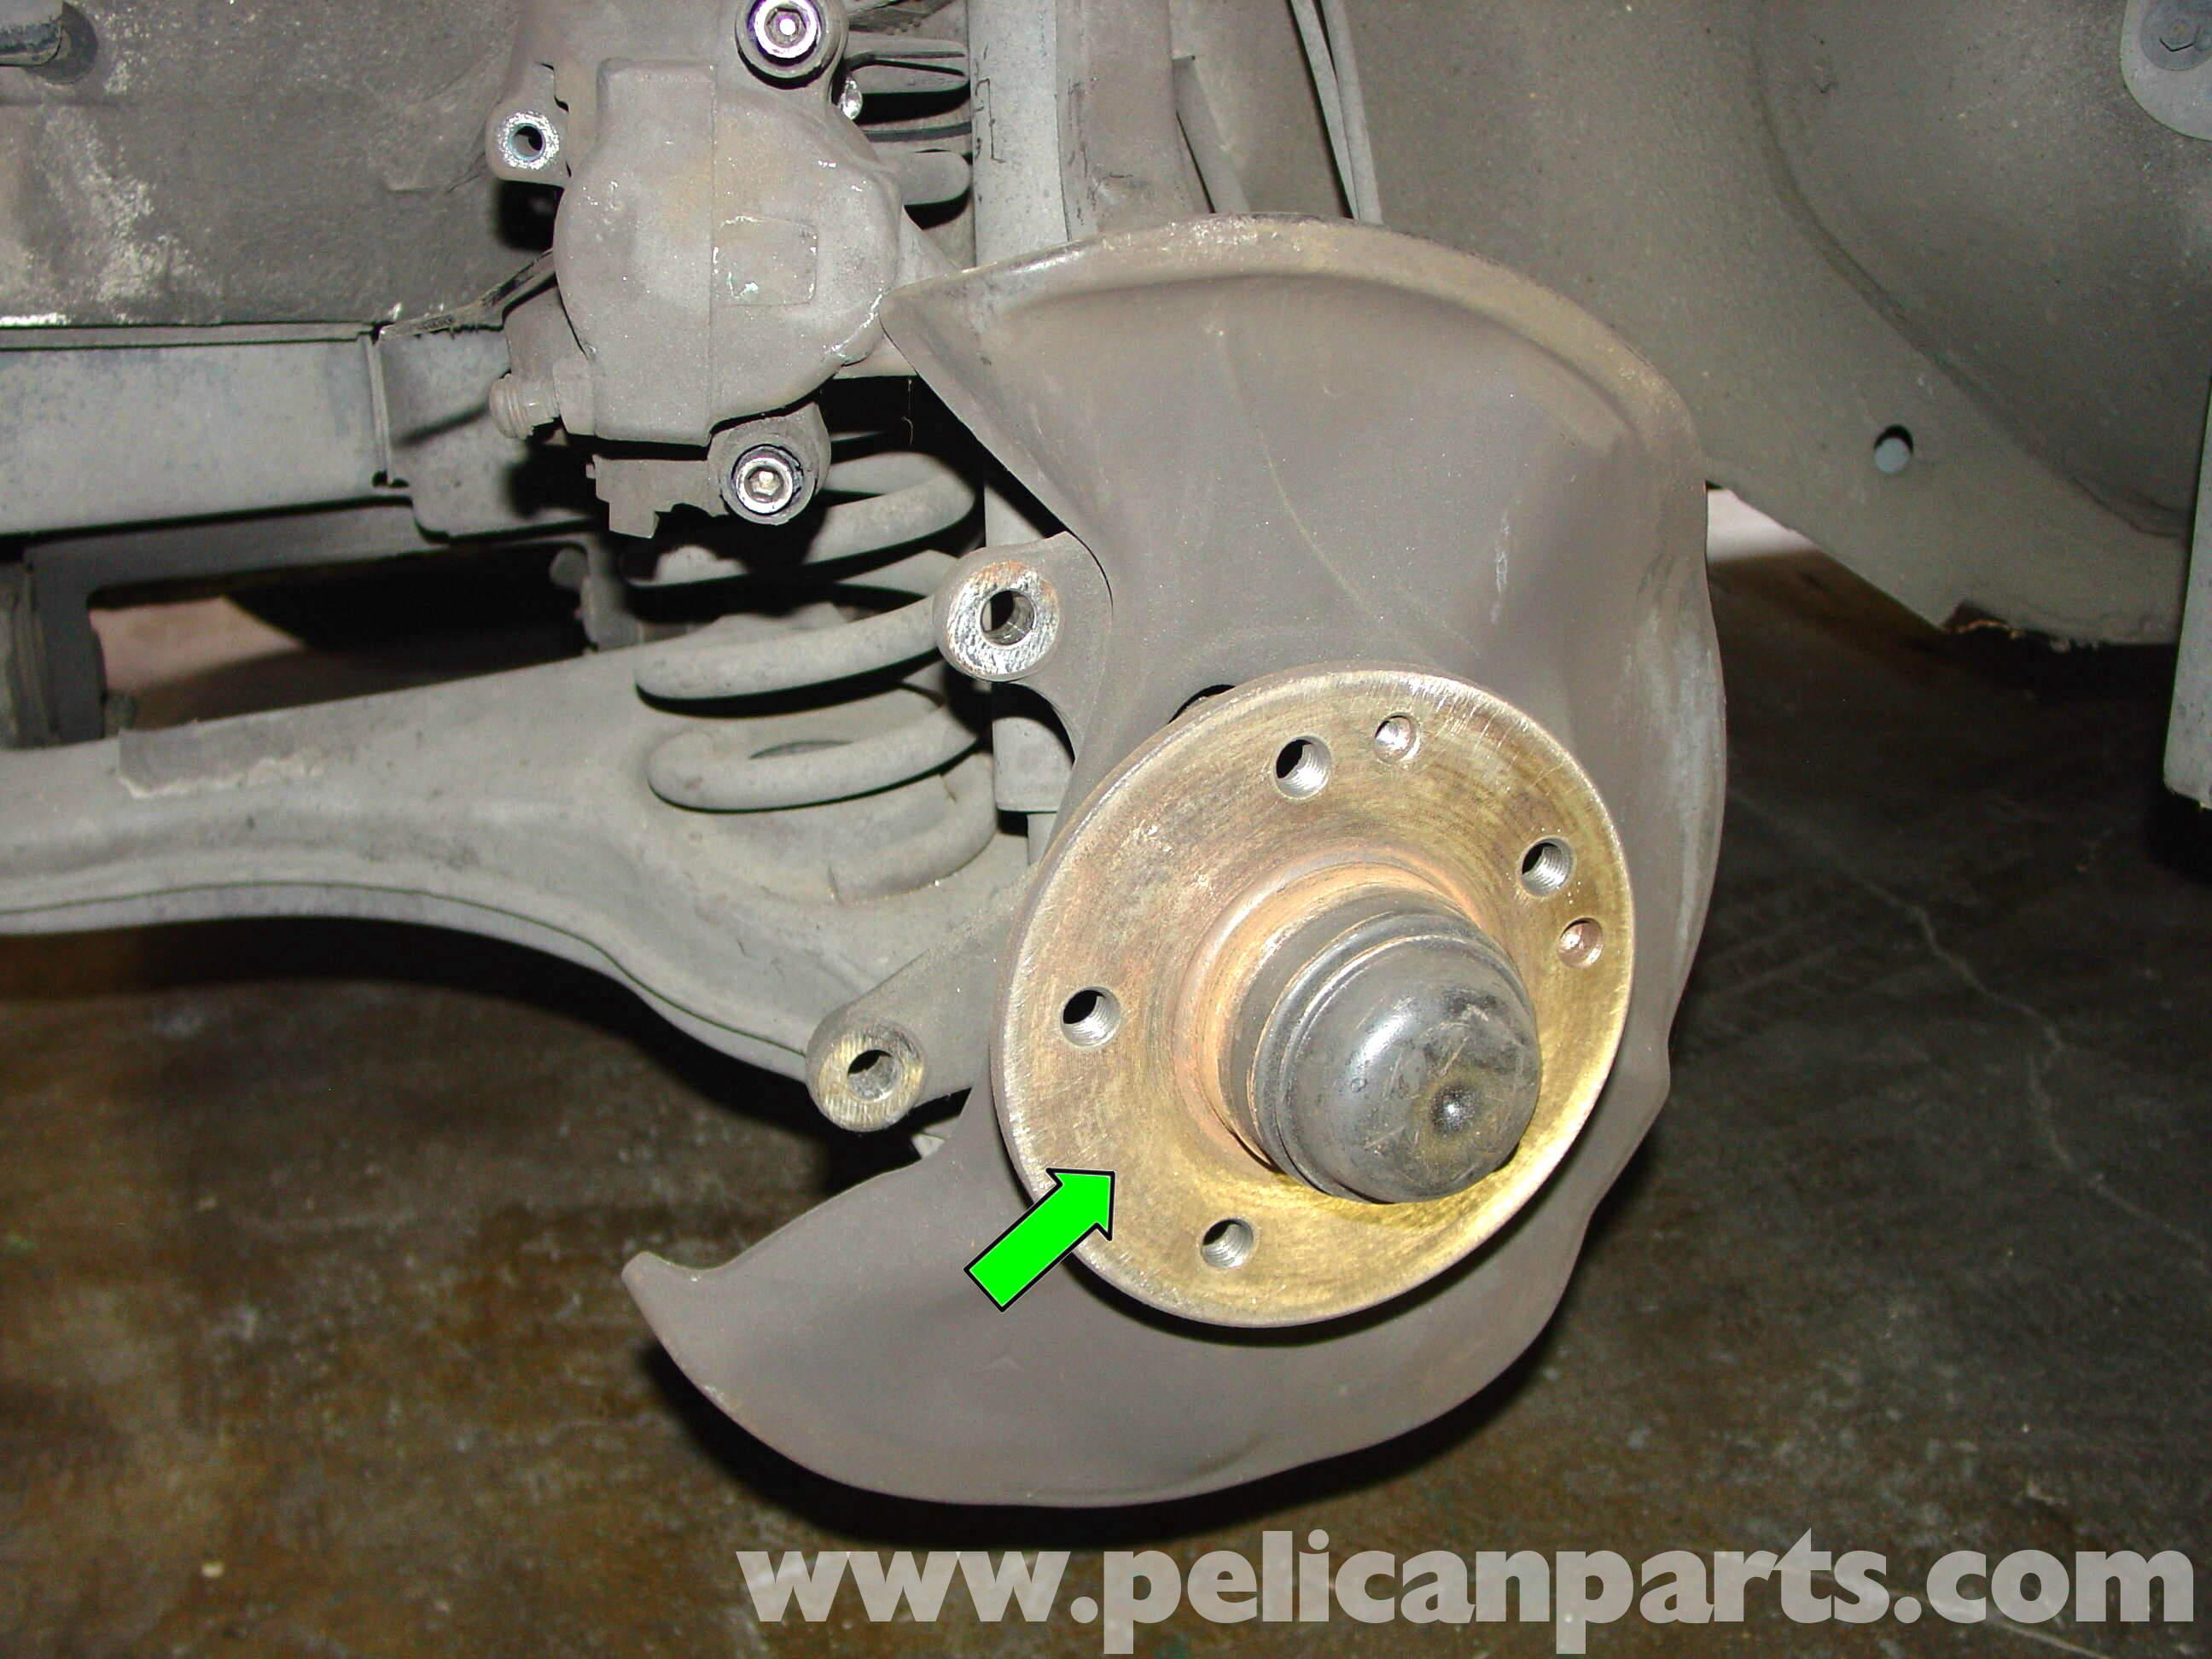 Mercedes E Brake Replacement